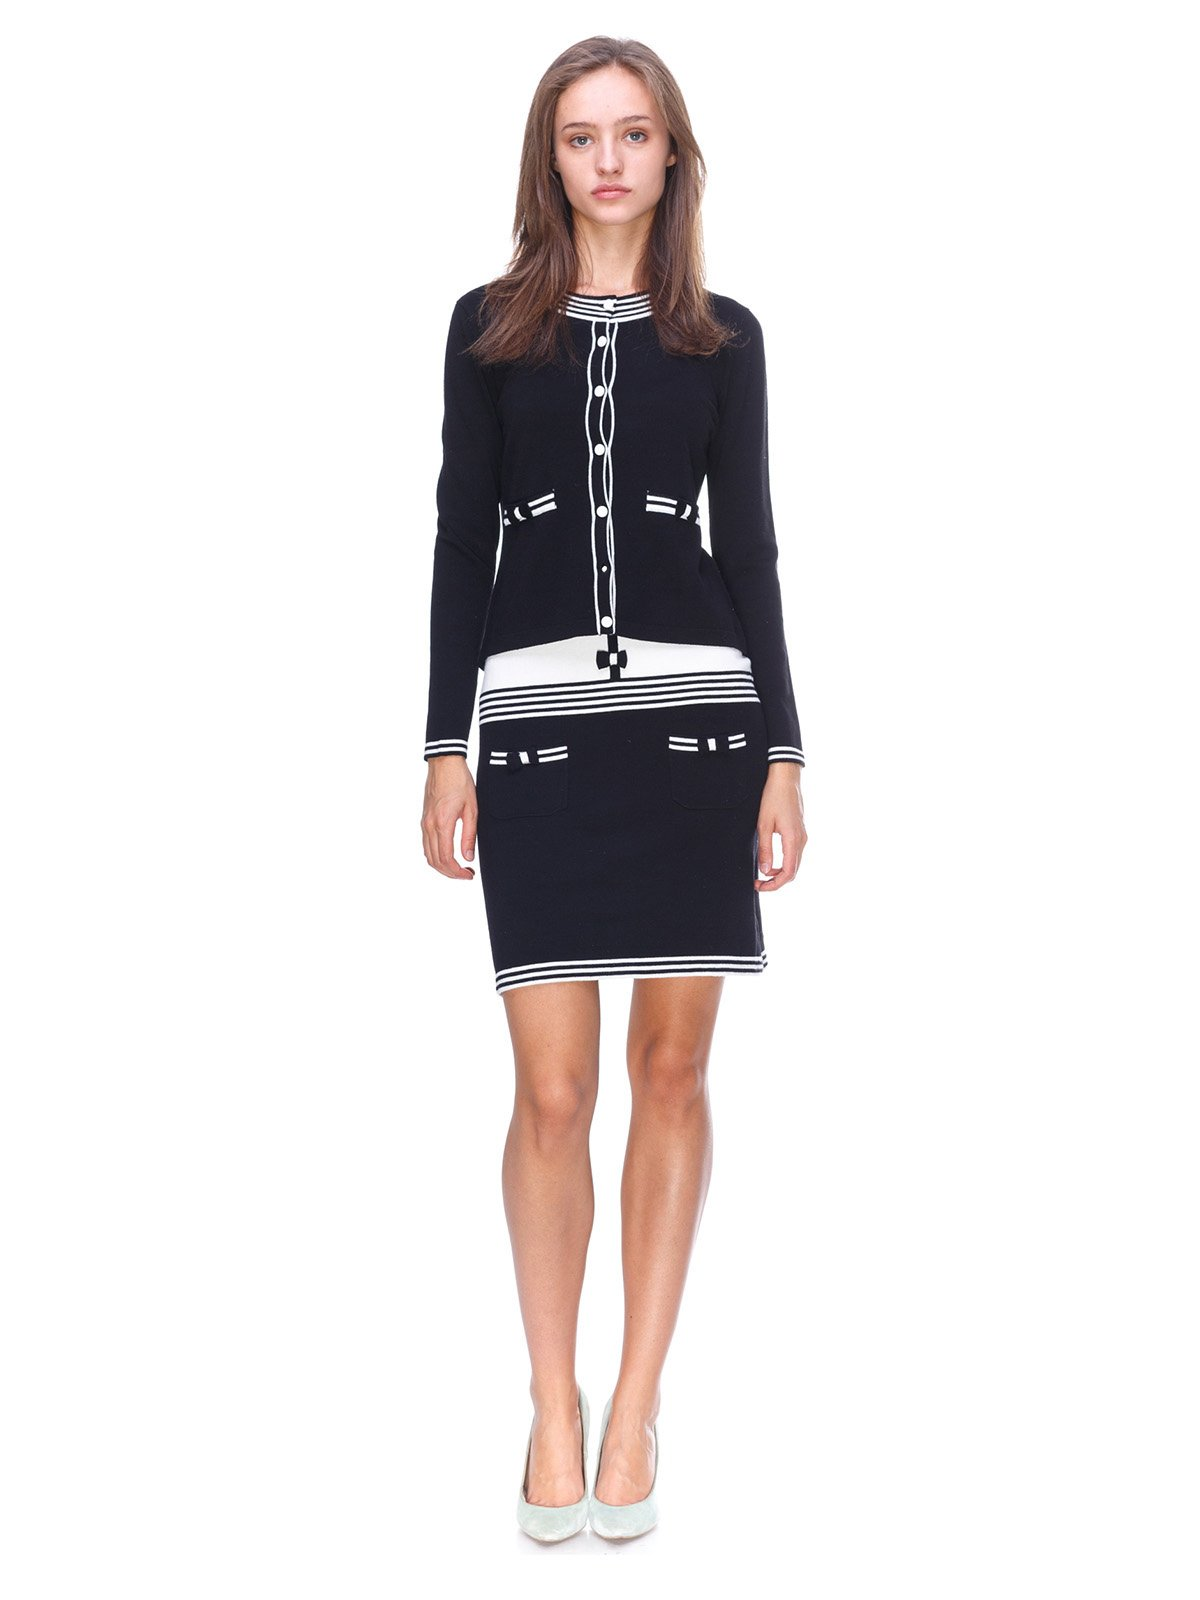 Комплект: кофта и платье | 2619555